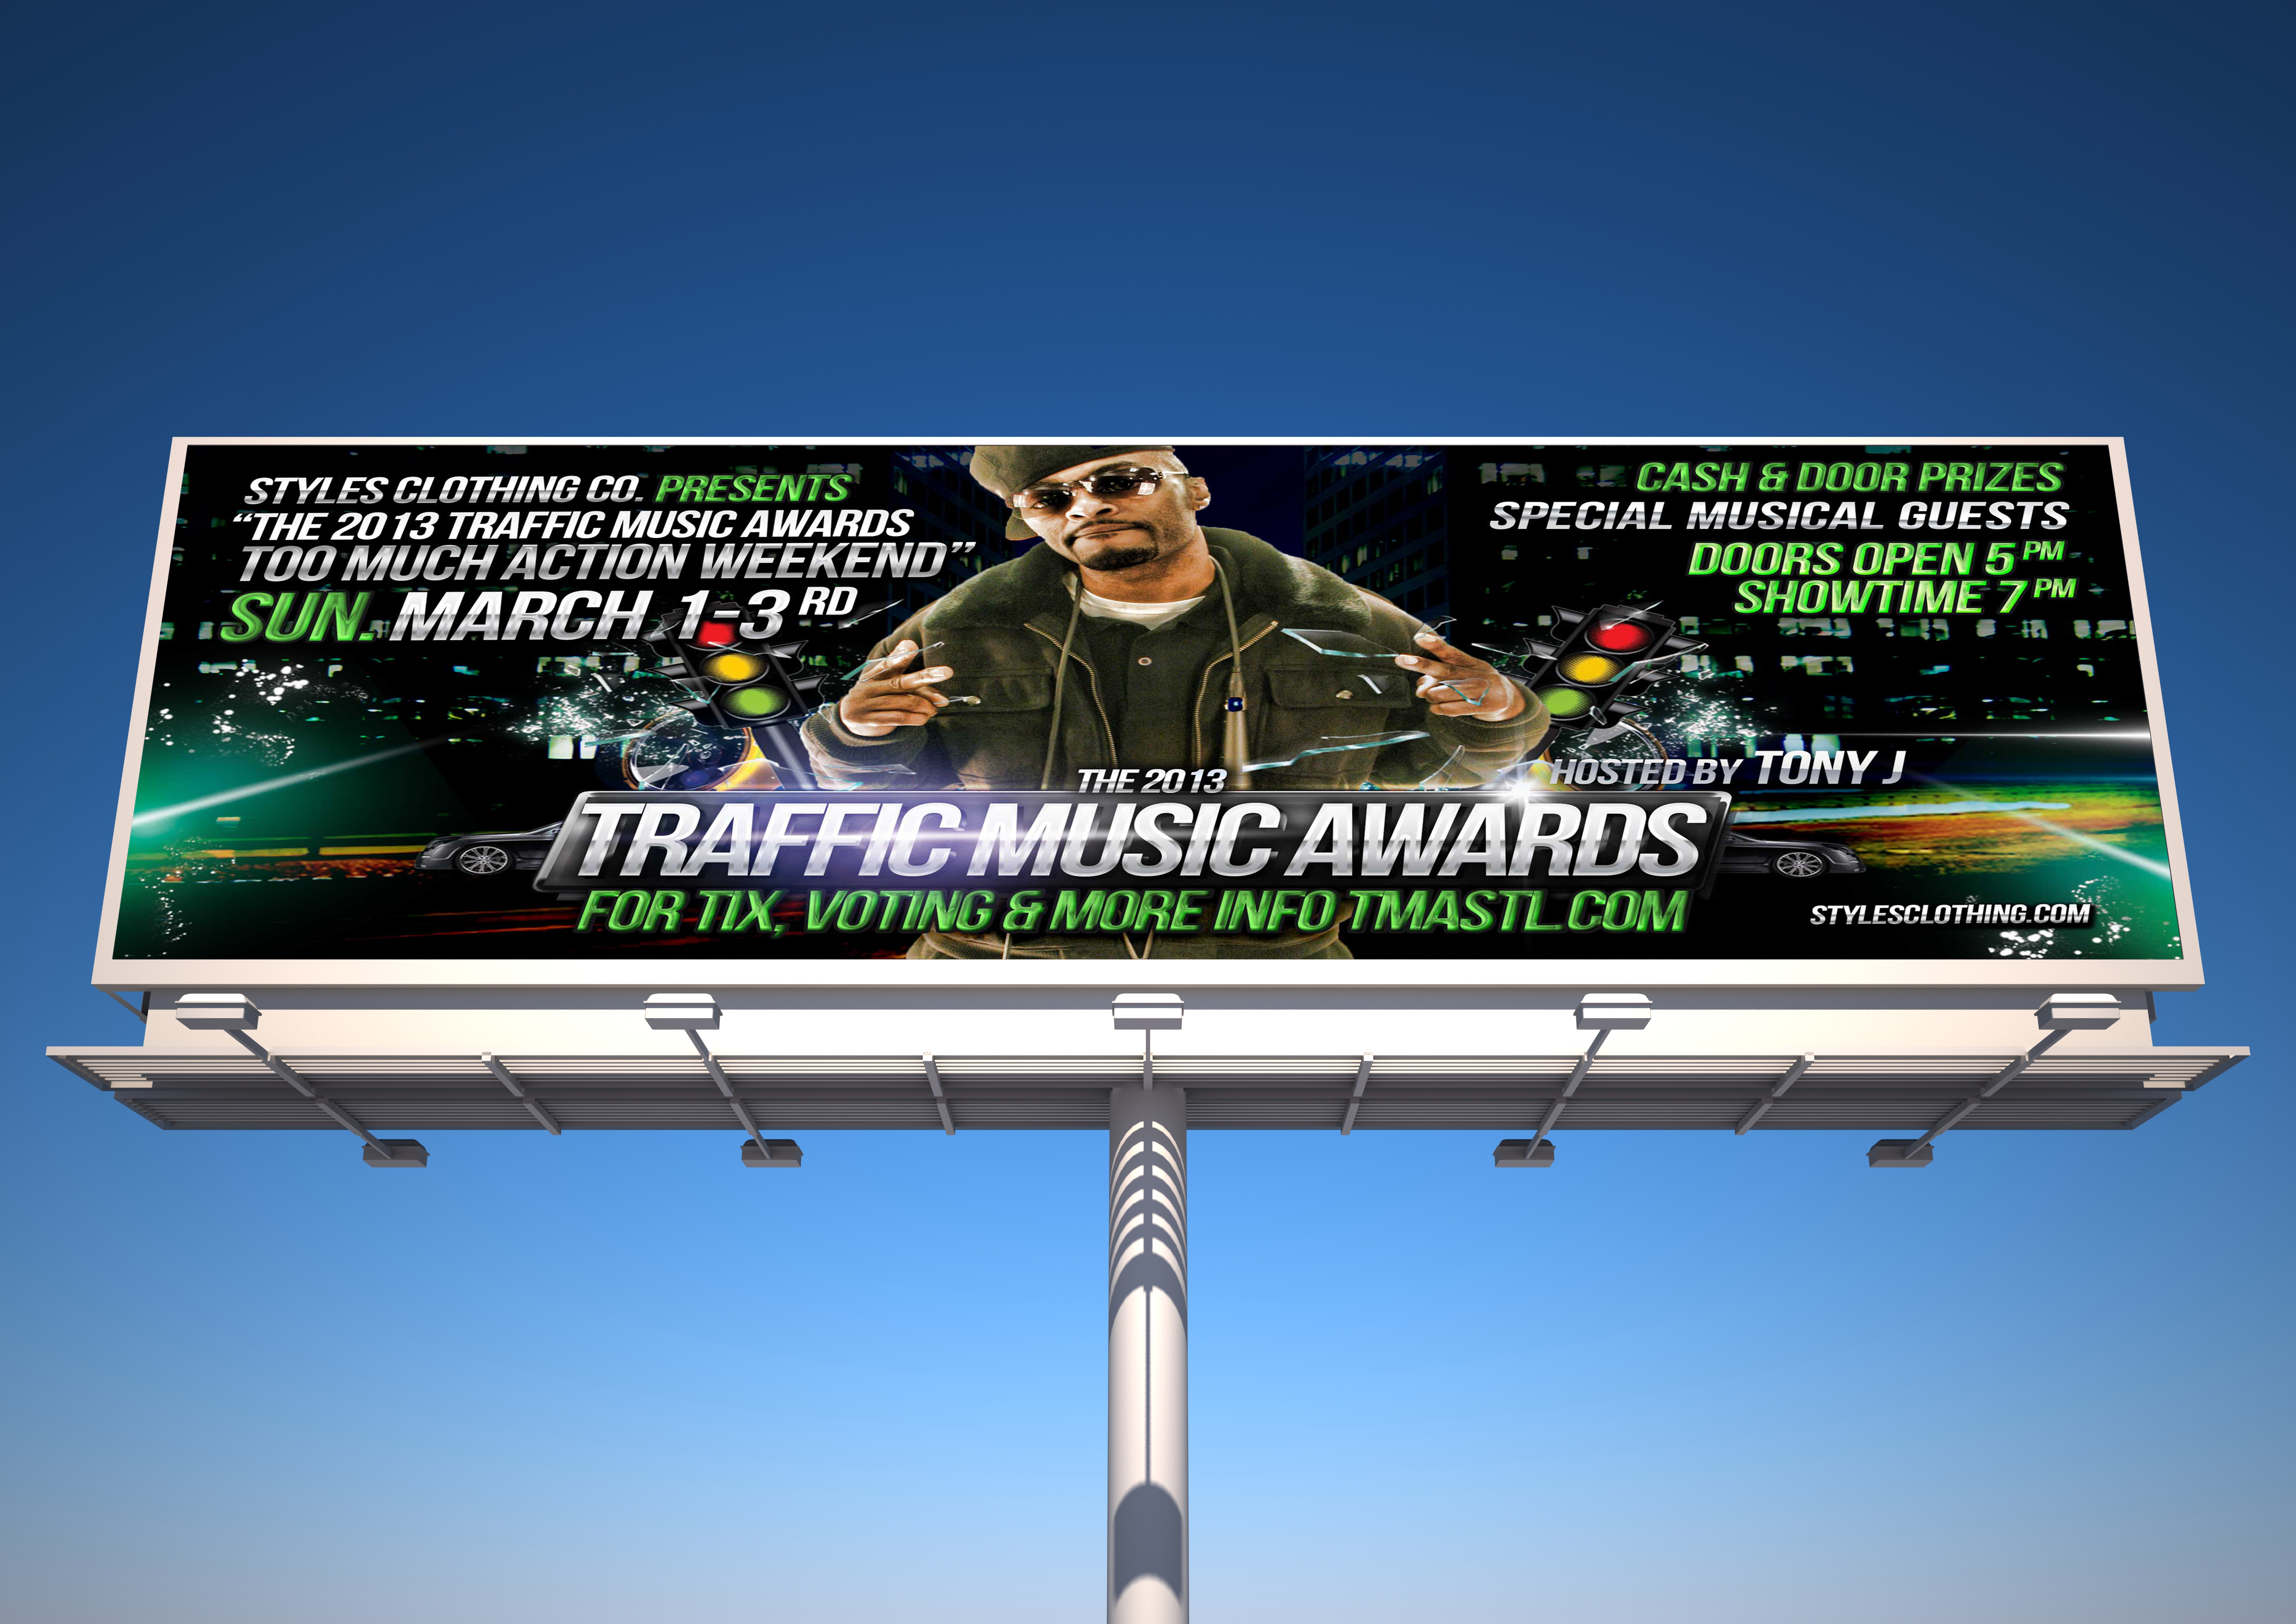 Traffic Music Awards